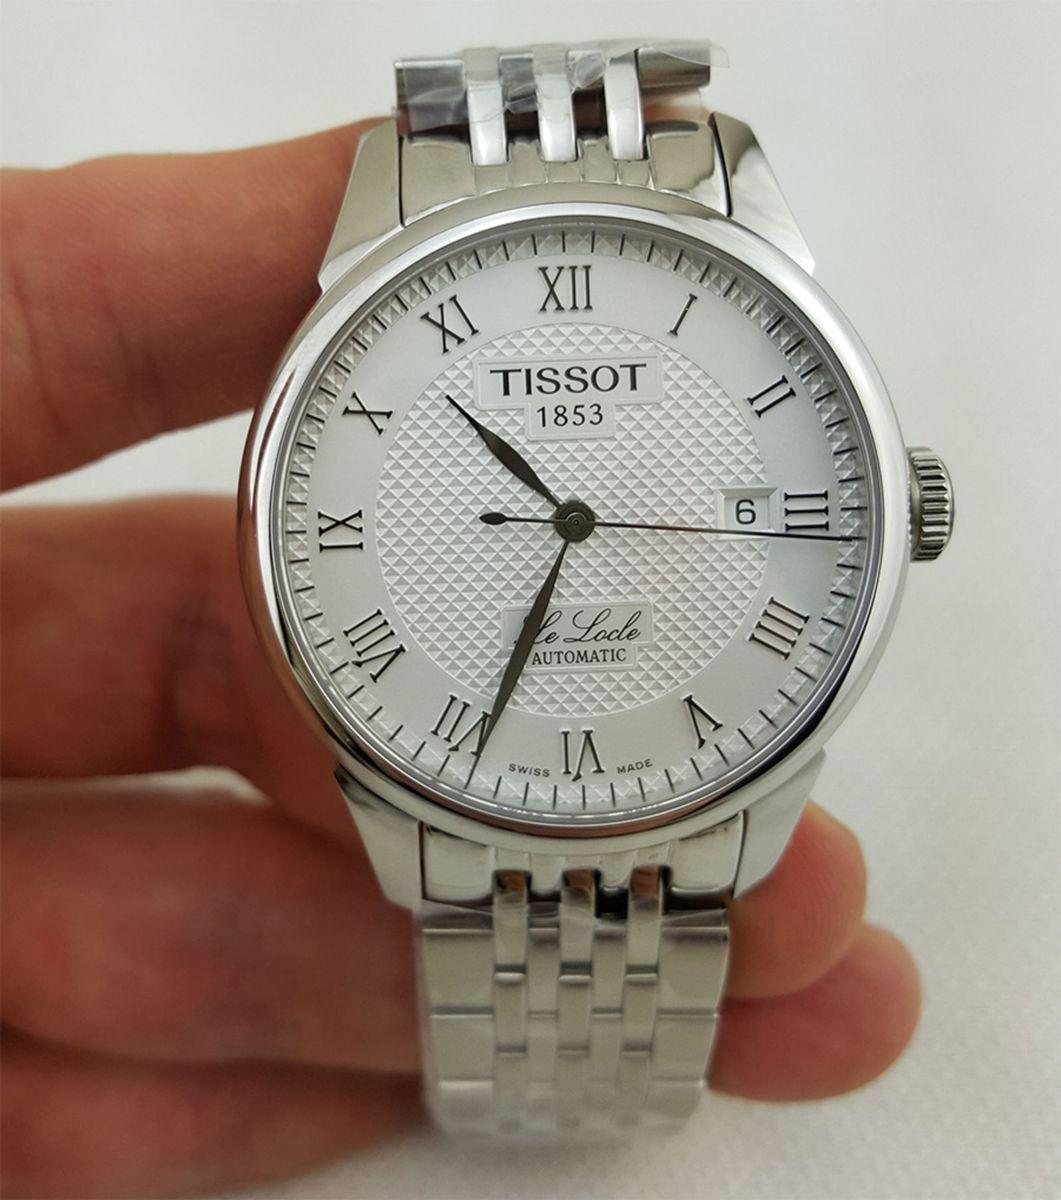 e581d04a5cd relógio tissot le locle automático na caixa tissot - relógios tissot